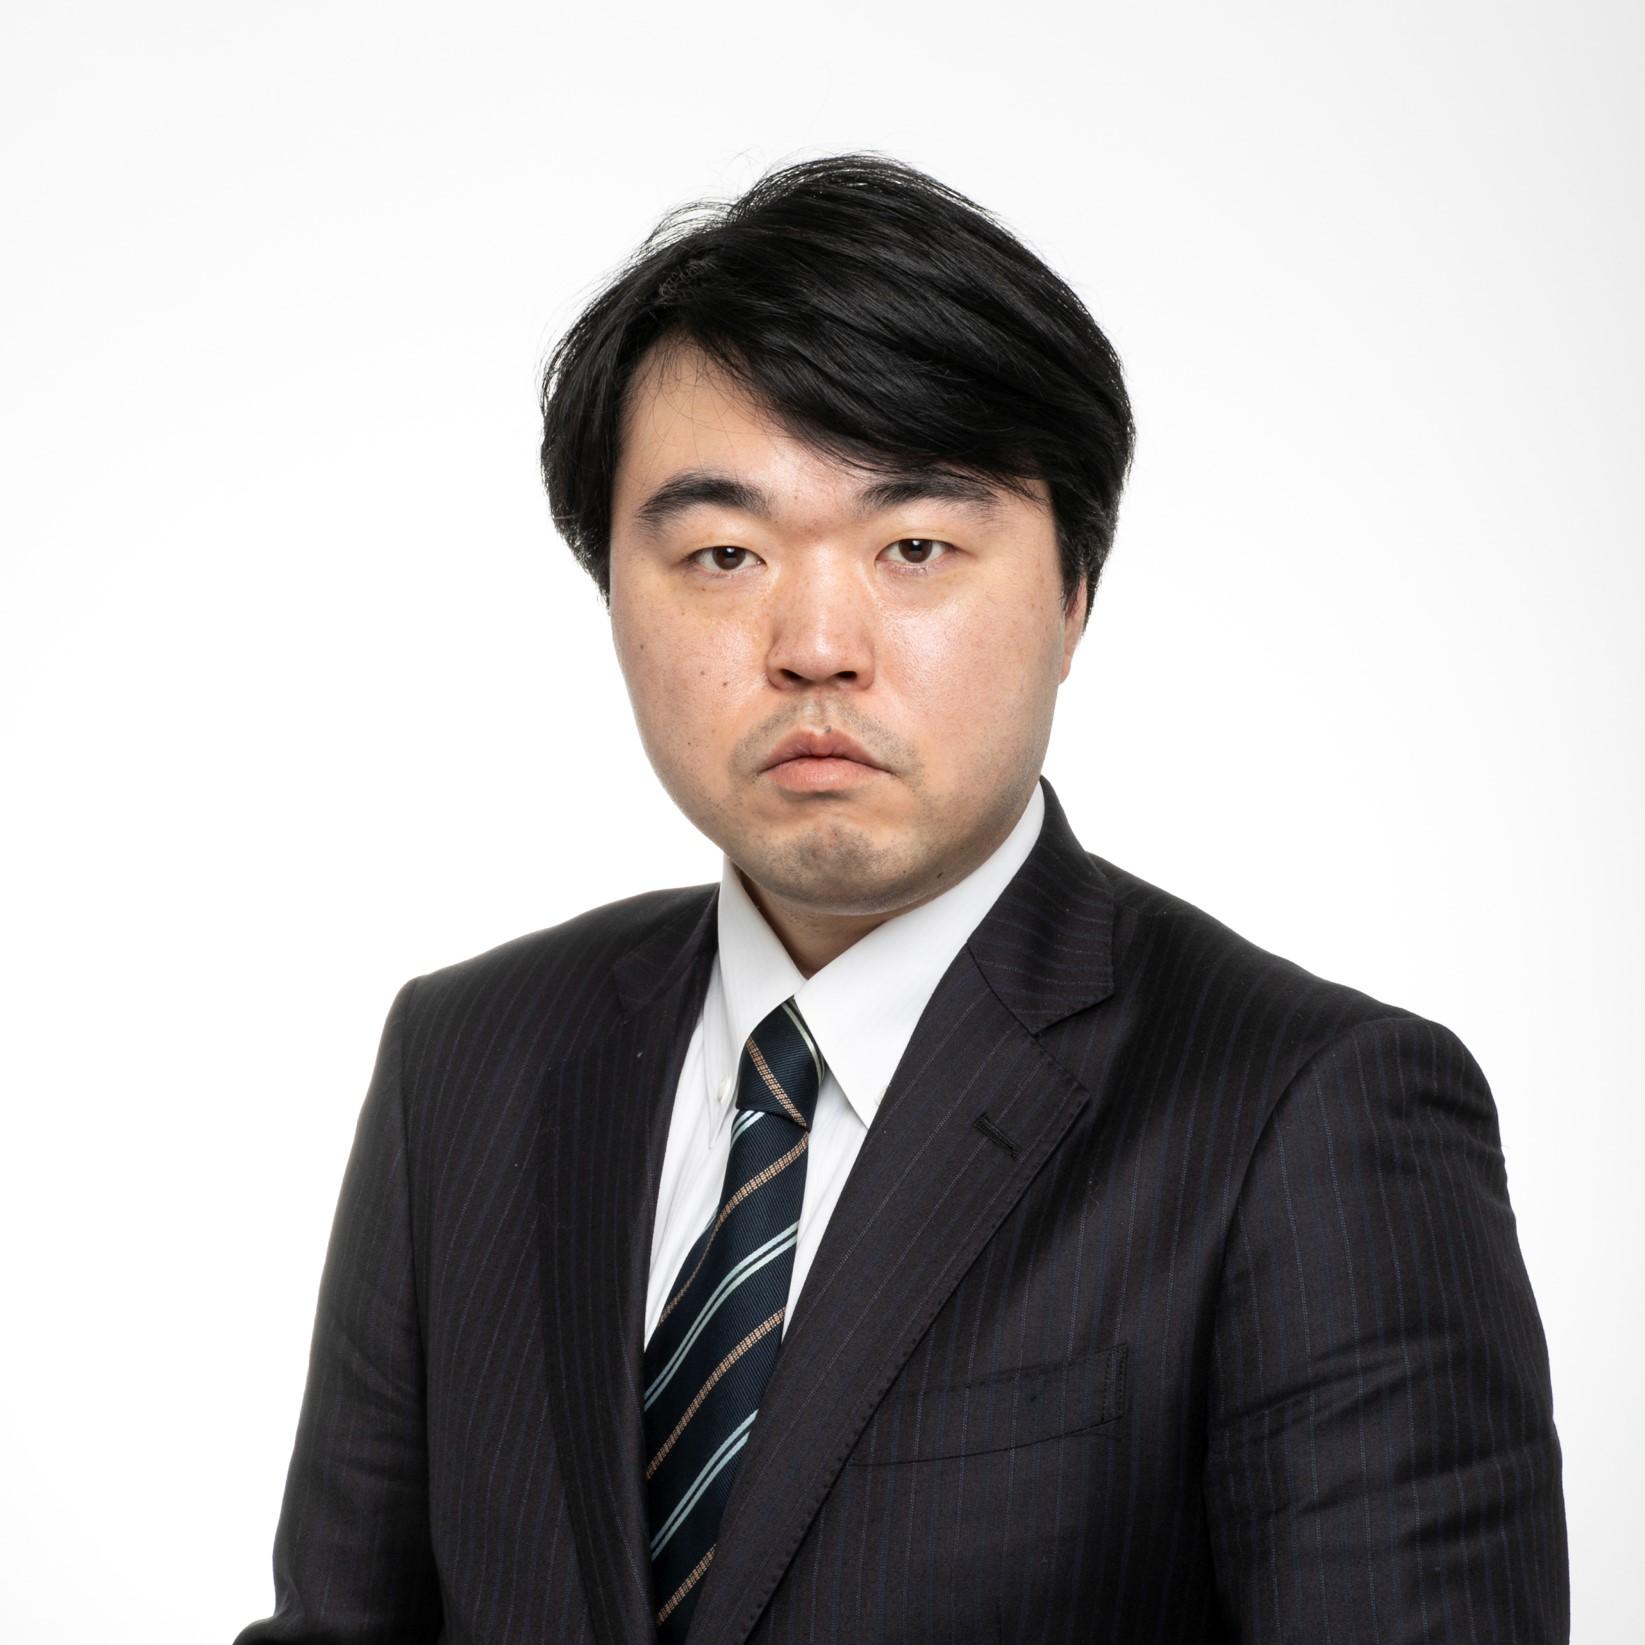 Wataru Kaminishi